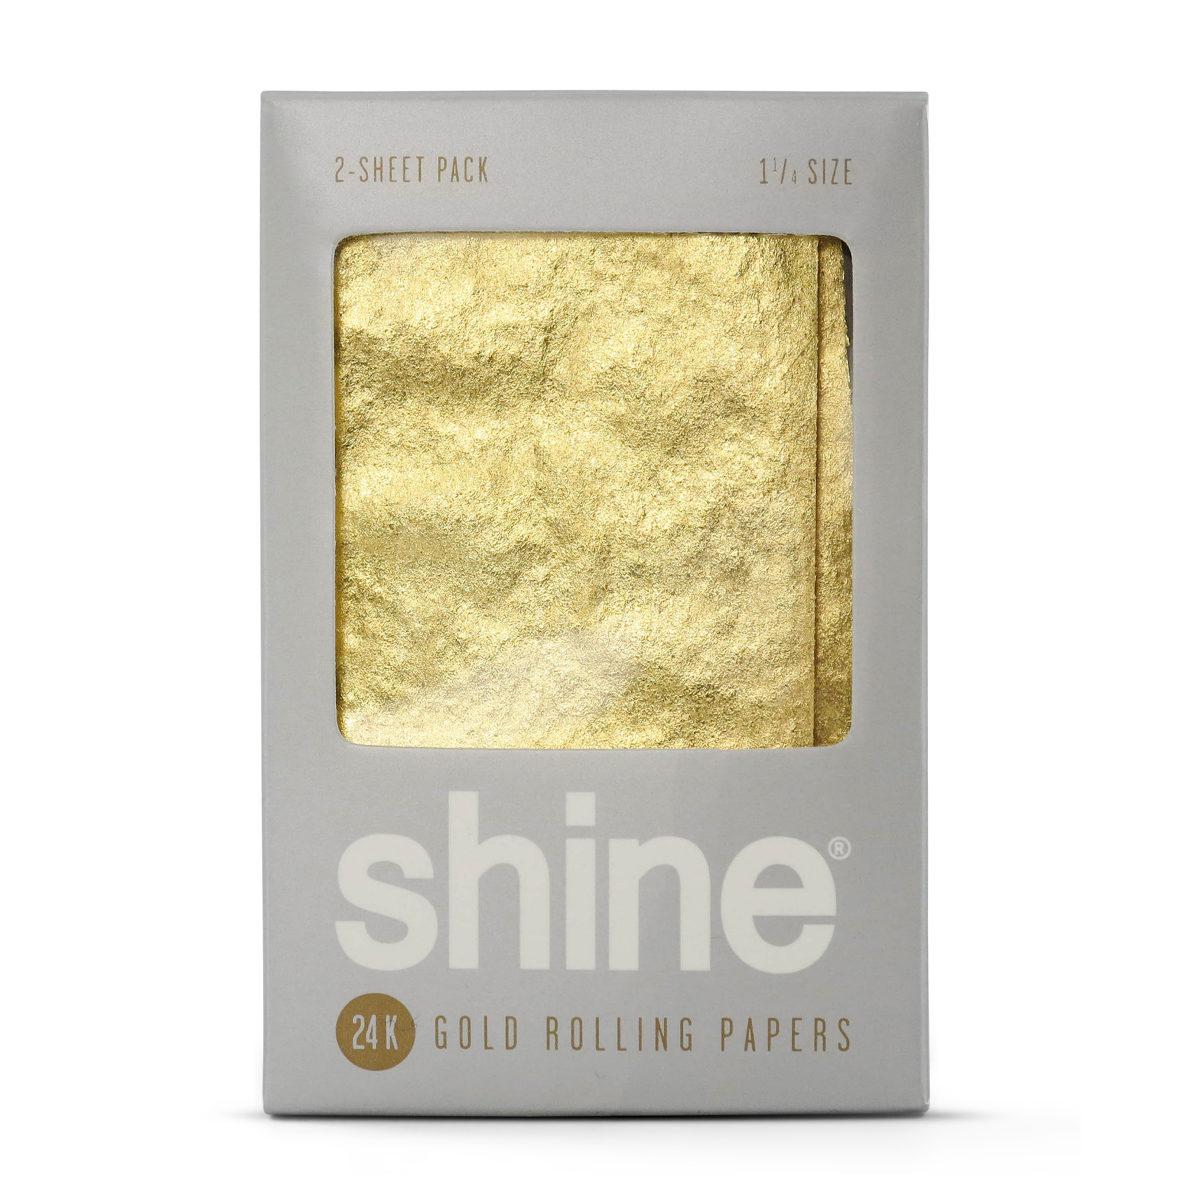 Papeles de Oro (1 1/4) - 2 Unidades [Shine] | Apegos Perú